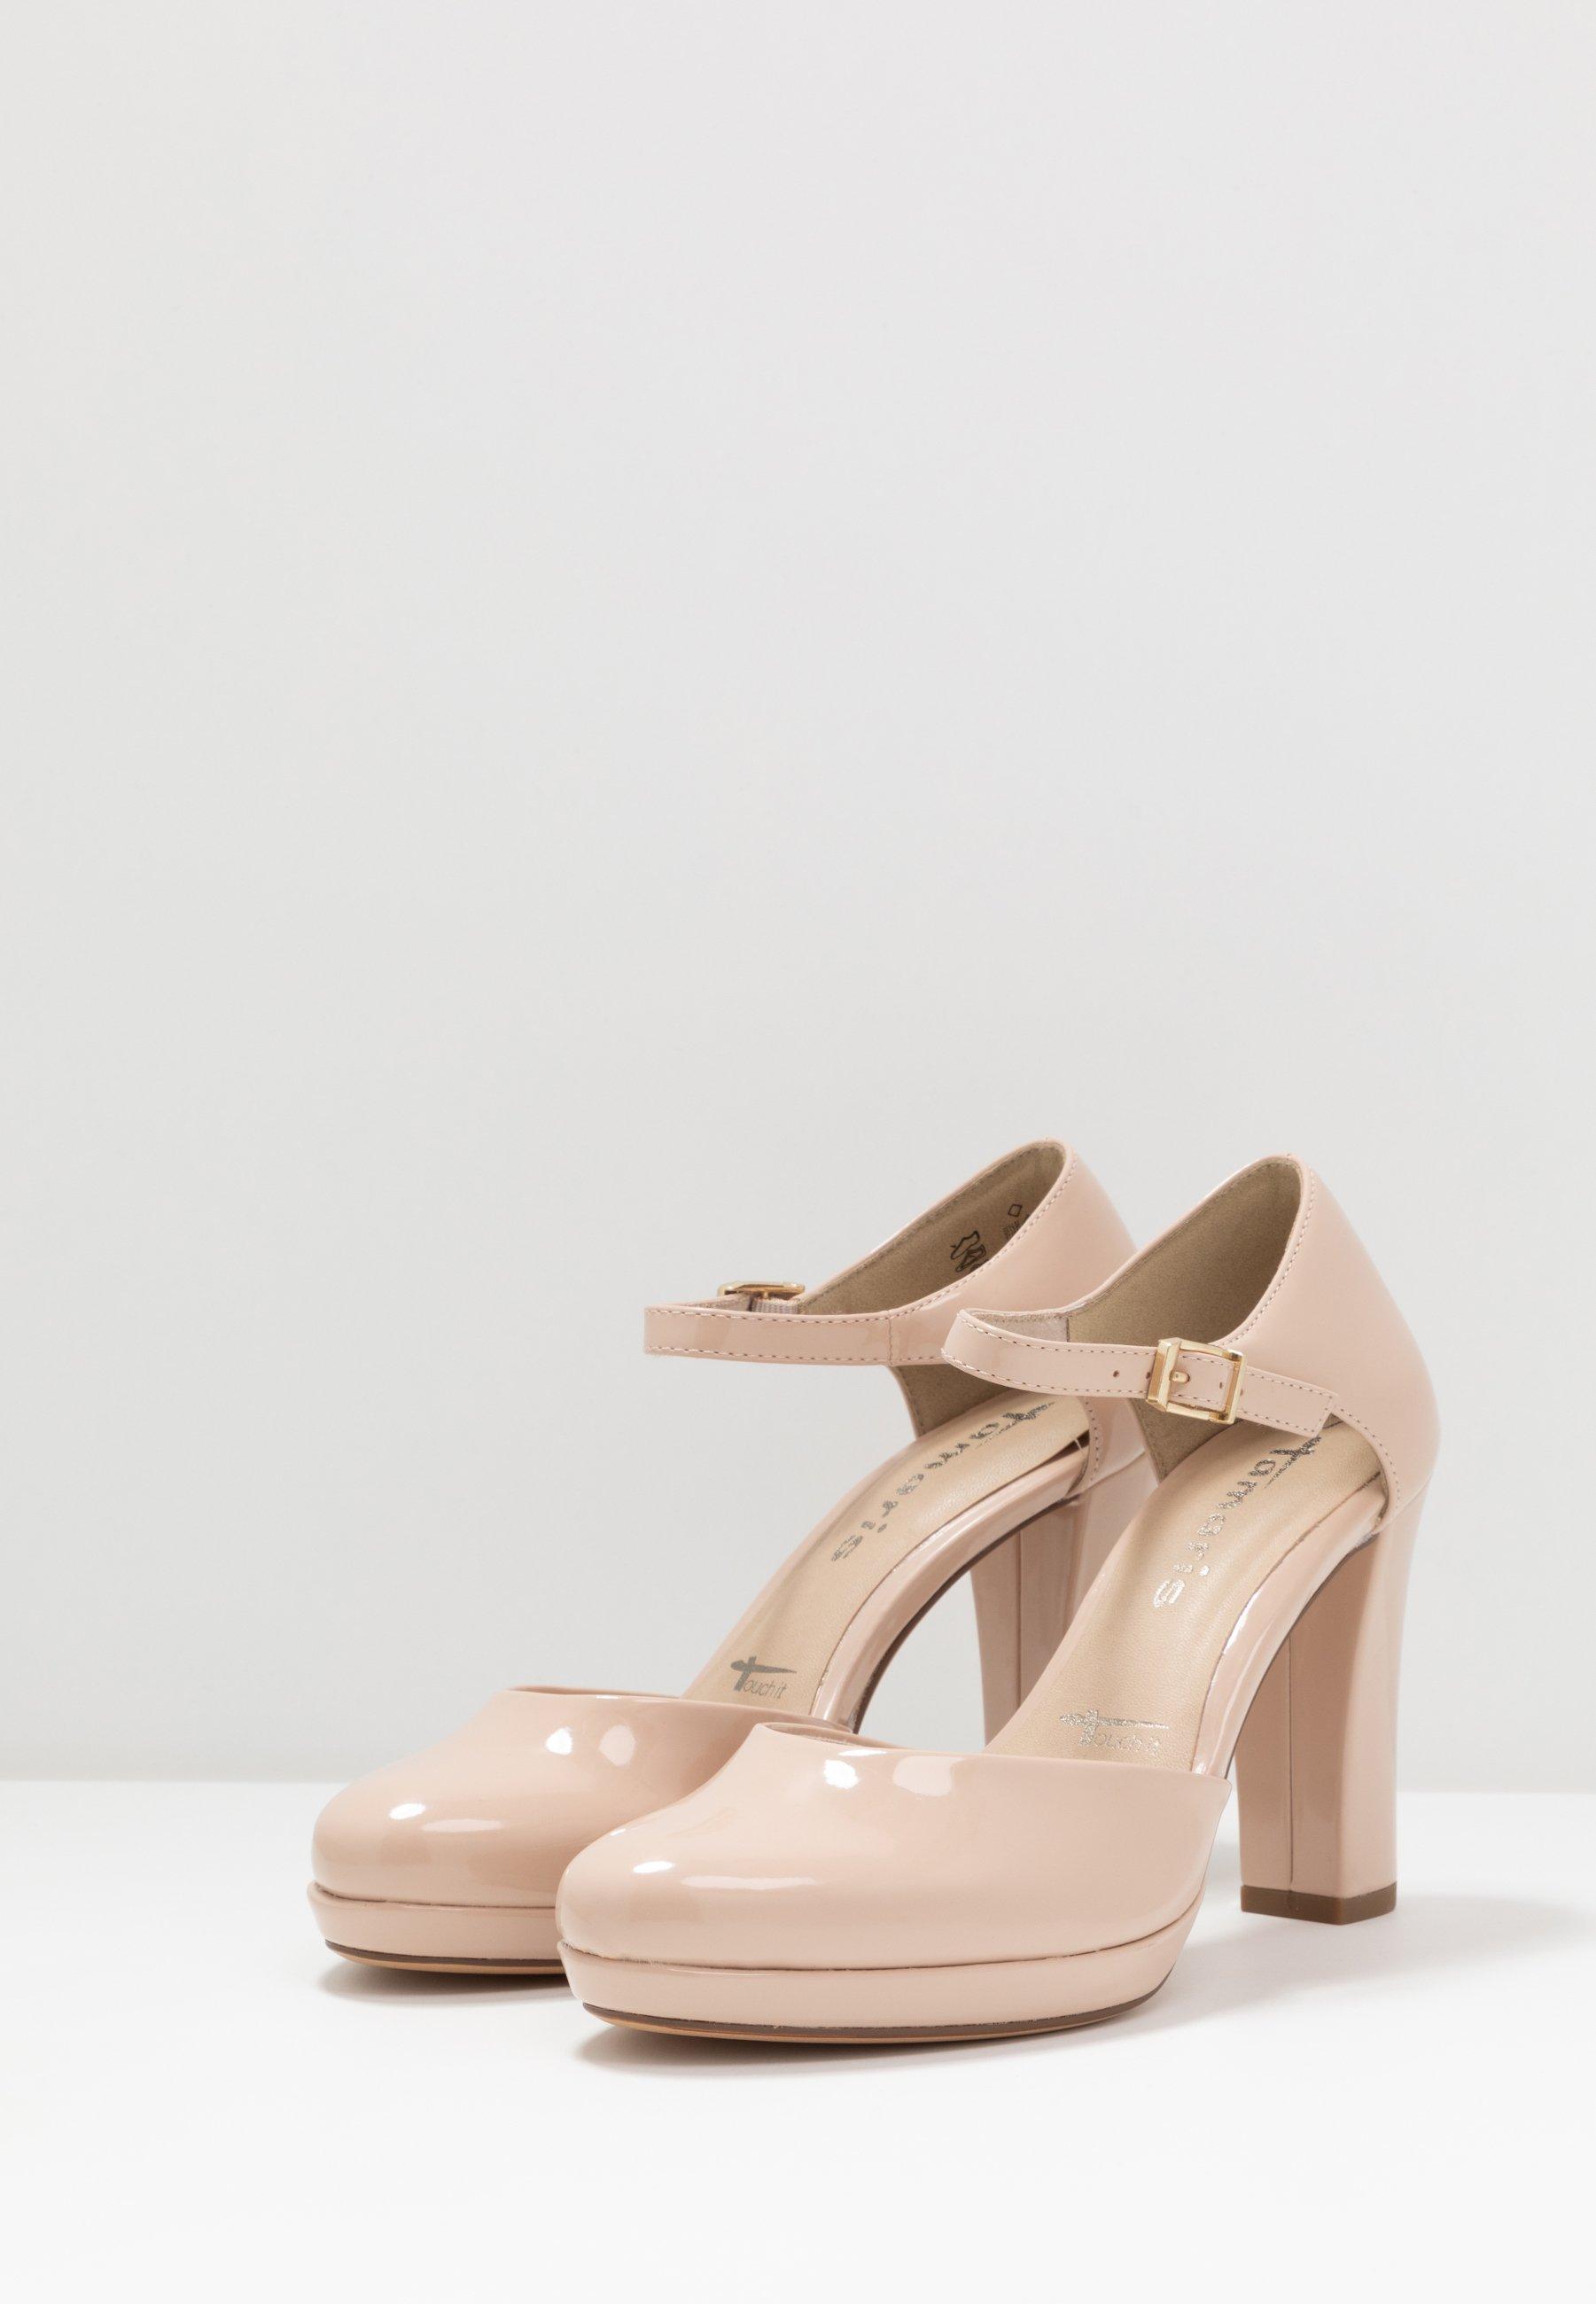 Tamaris Tendencia 22422 Nude Tacón De Plataforma Oculta patente Tribunal Zapatos